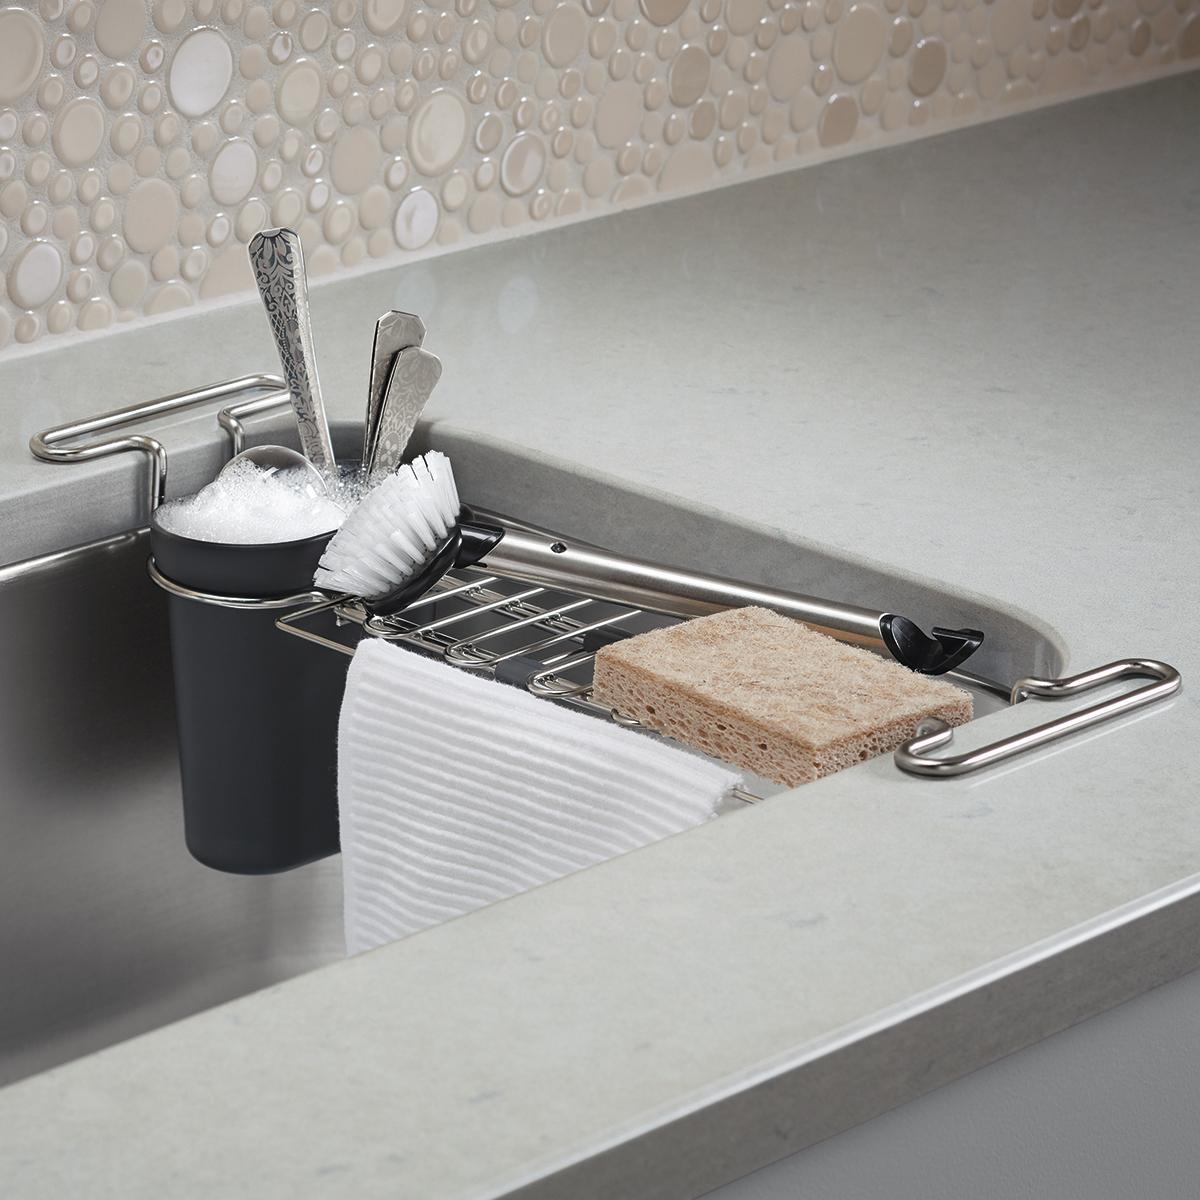 kohler chrome kitchen sink utility rack the container store rh containerstore com chrome kitchen sink soap dispenser chrome kitchen sink taps